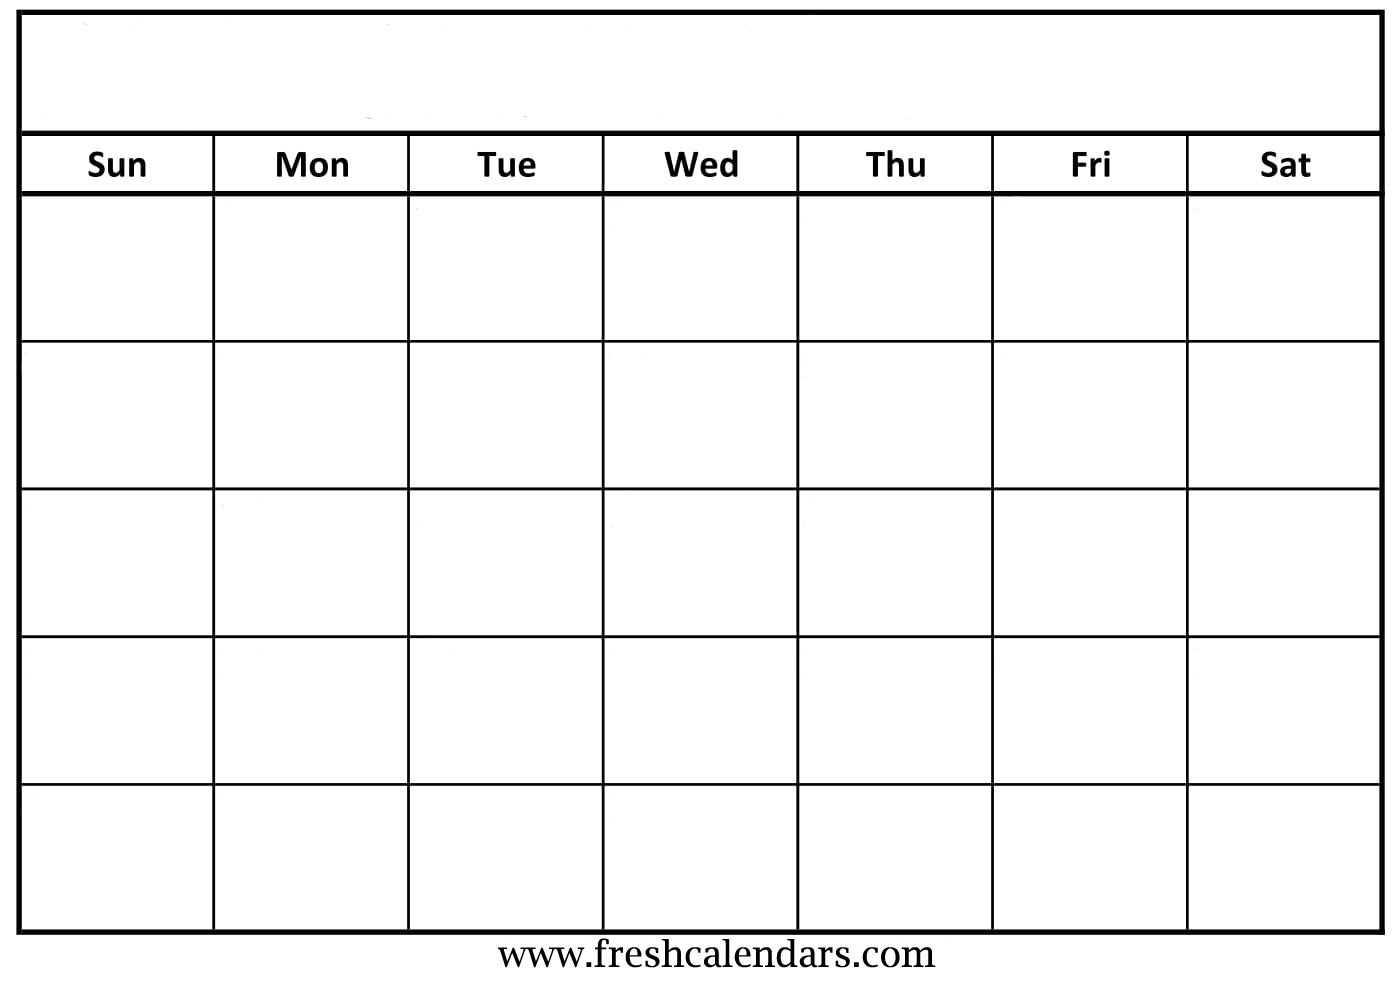 30 Blank Calendar Template 2019 | Andaluzseattle Template Regarding Full Page Blank Calendar Template